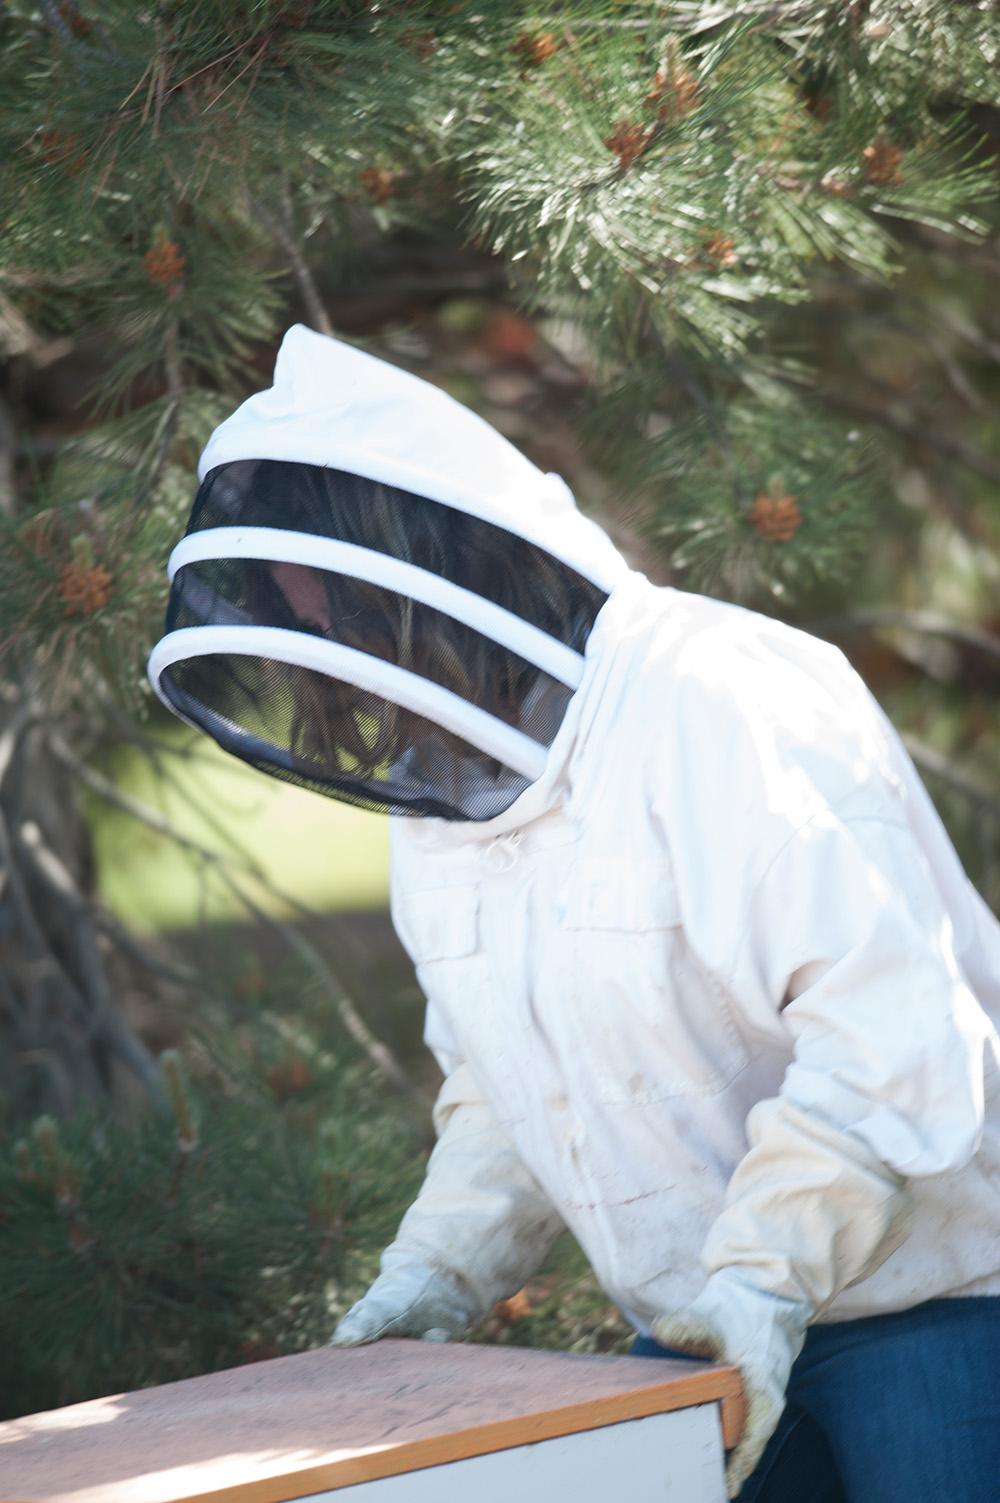 protective beekeeping clothing